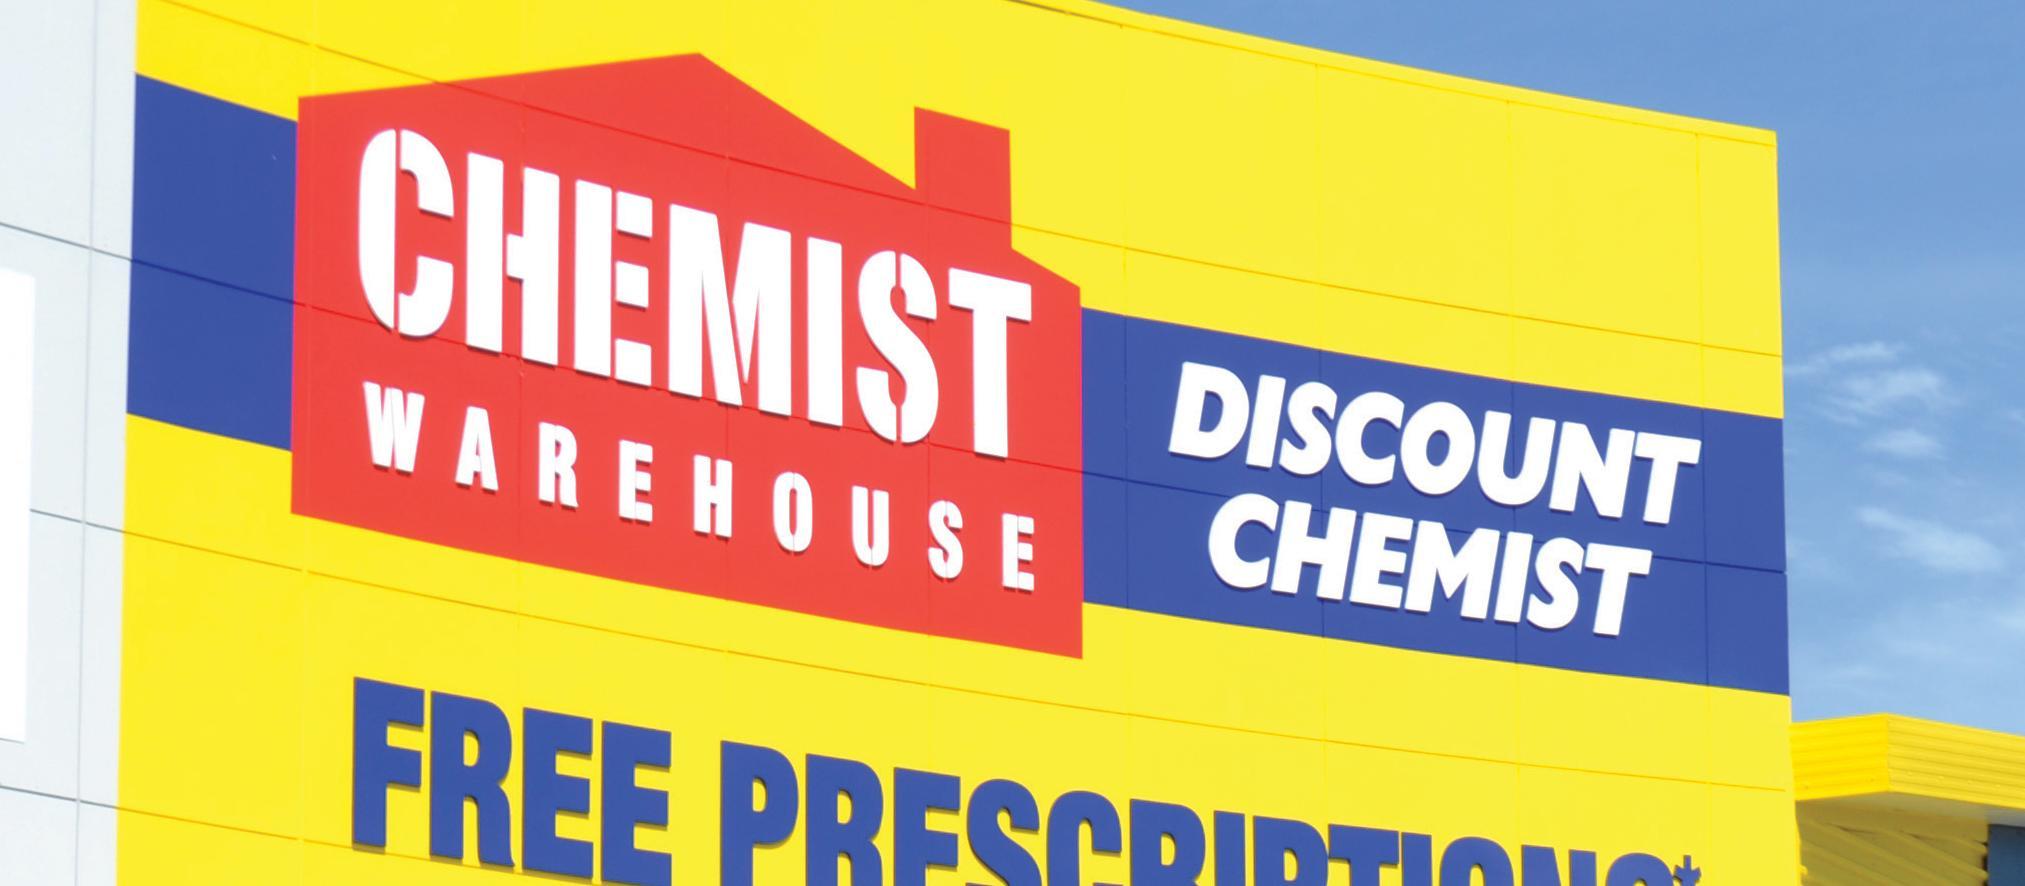 b57af284e7b Chemist Warehouse Australia outraged over ad on its shopper dockets ...